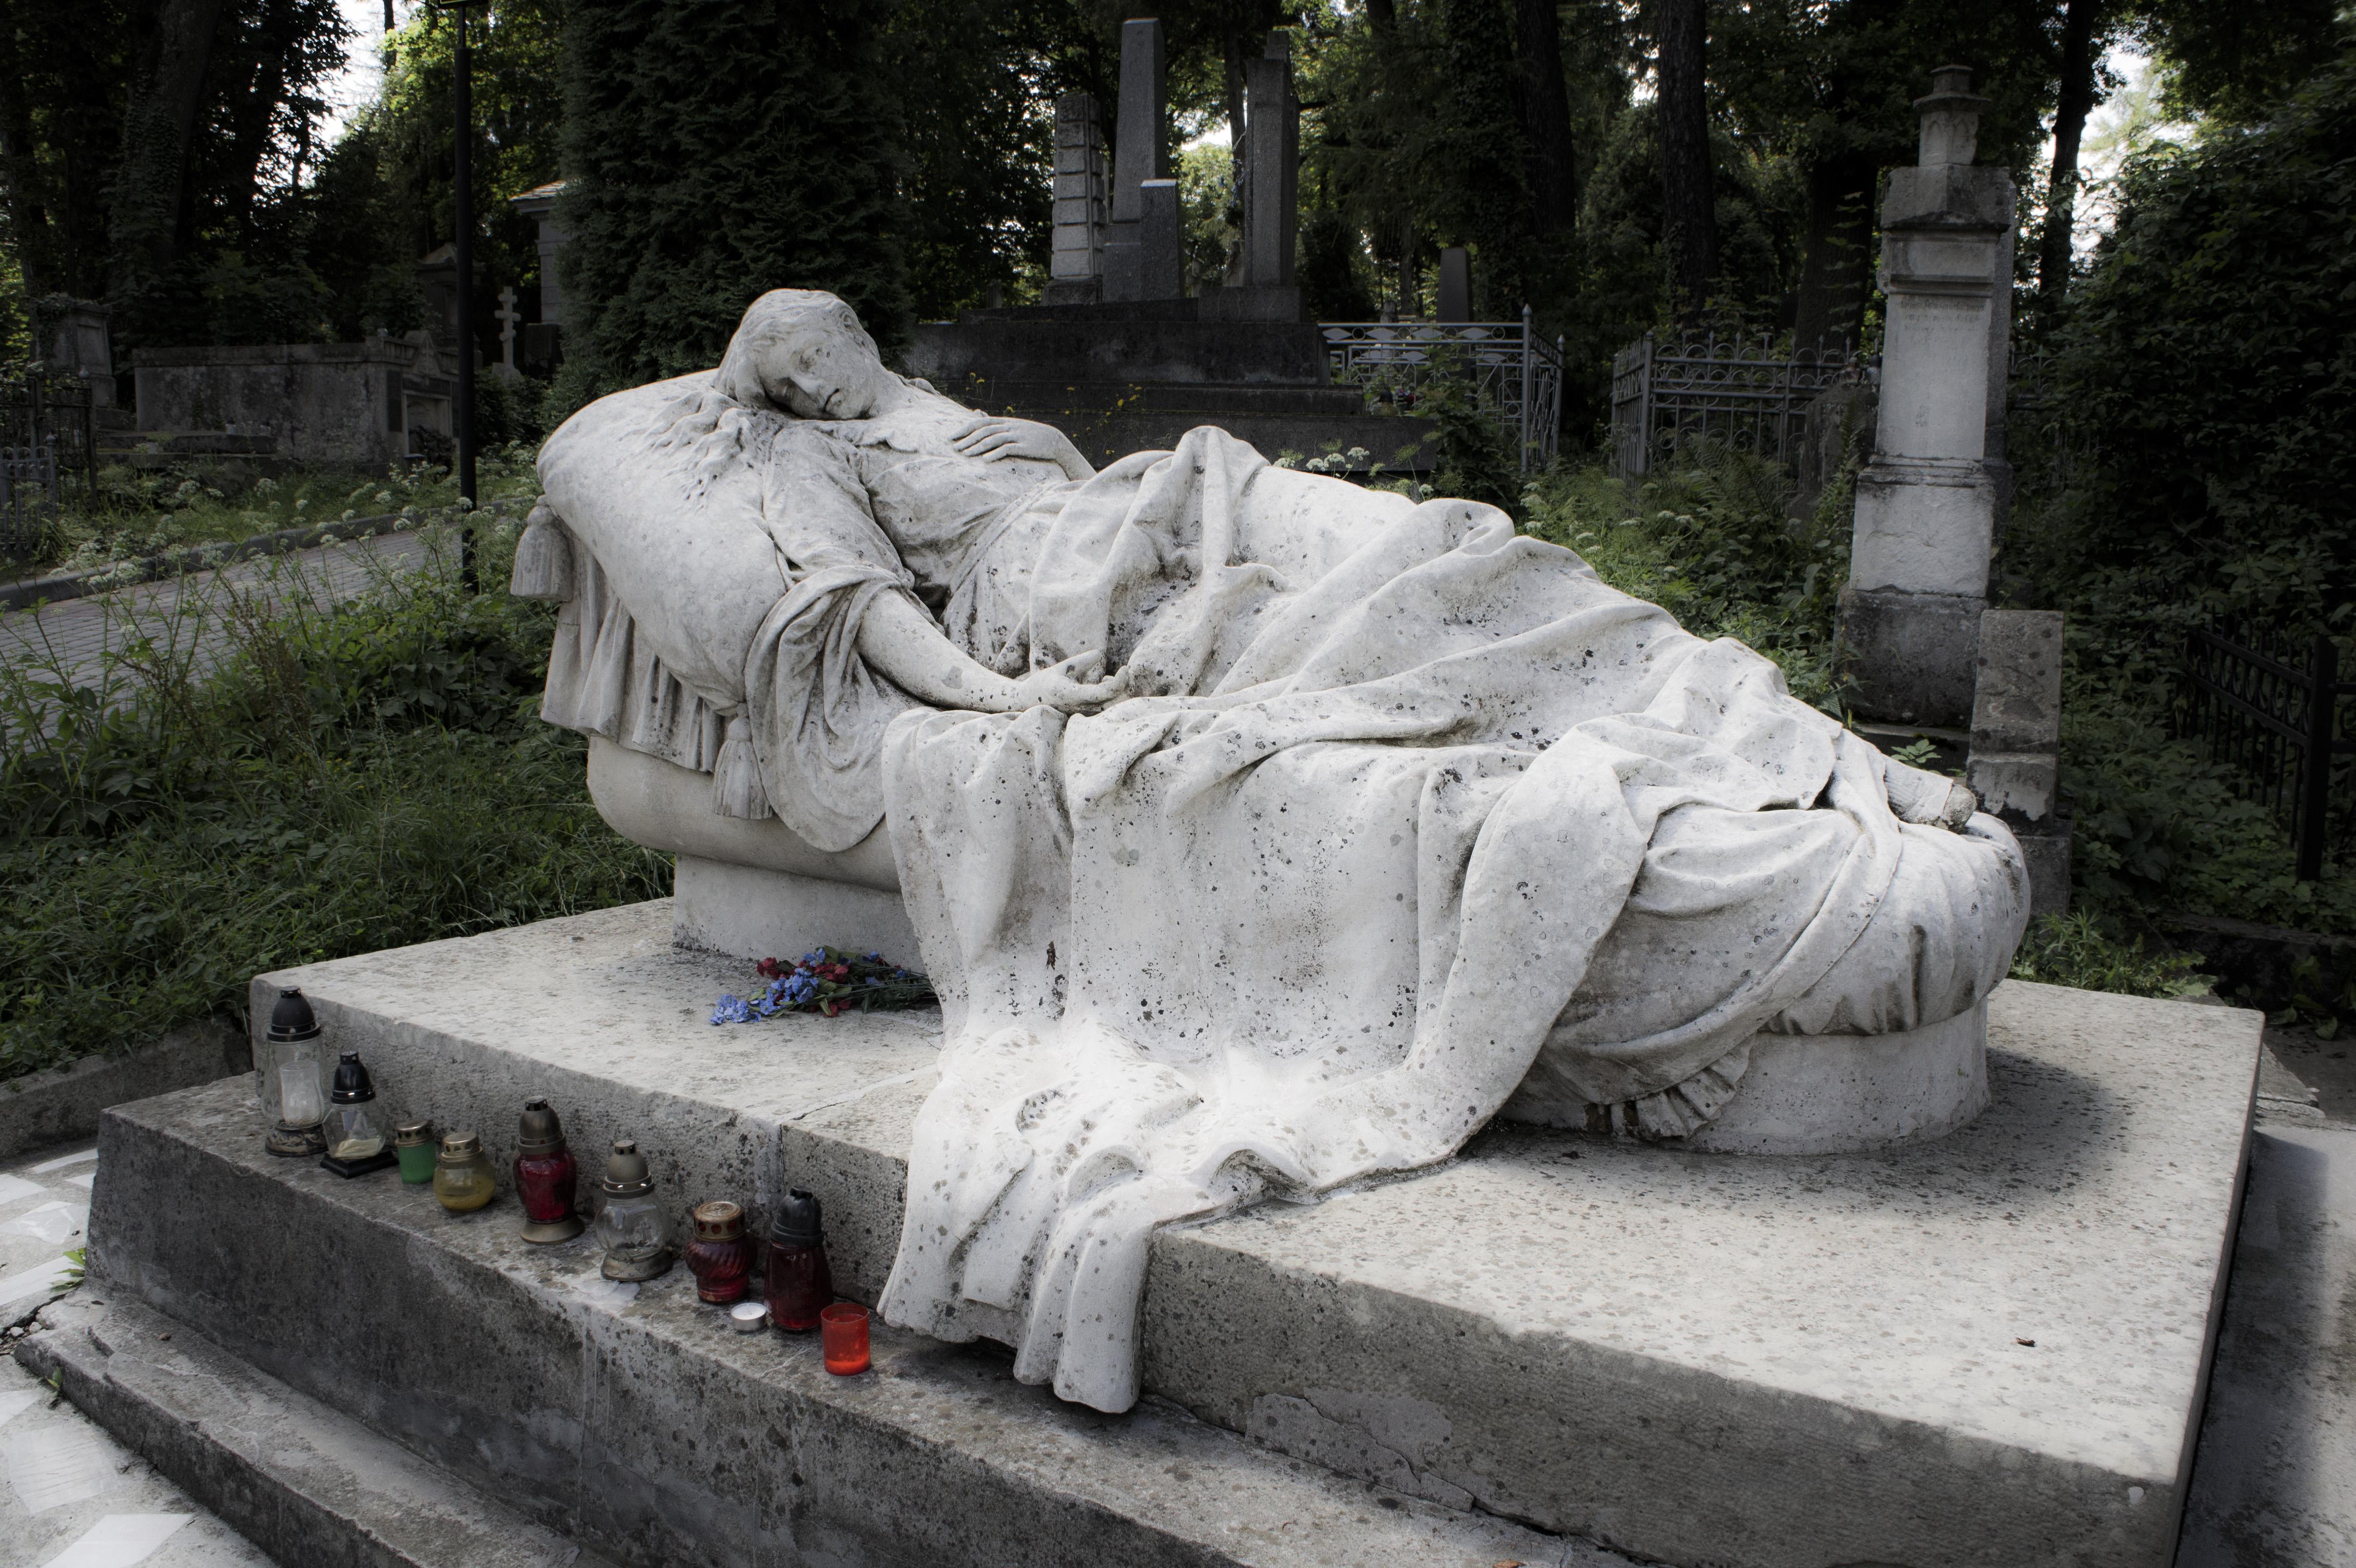 https://upload.wikimedia.org/wikipedia/commons/a/a5/Lychakiv_Cemetery_%28Lviv%29.JPG